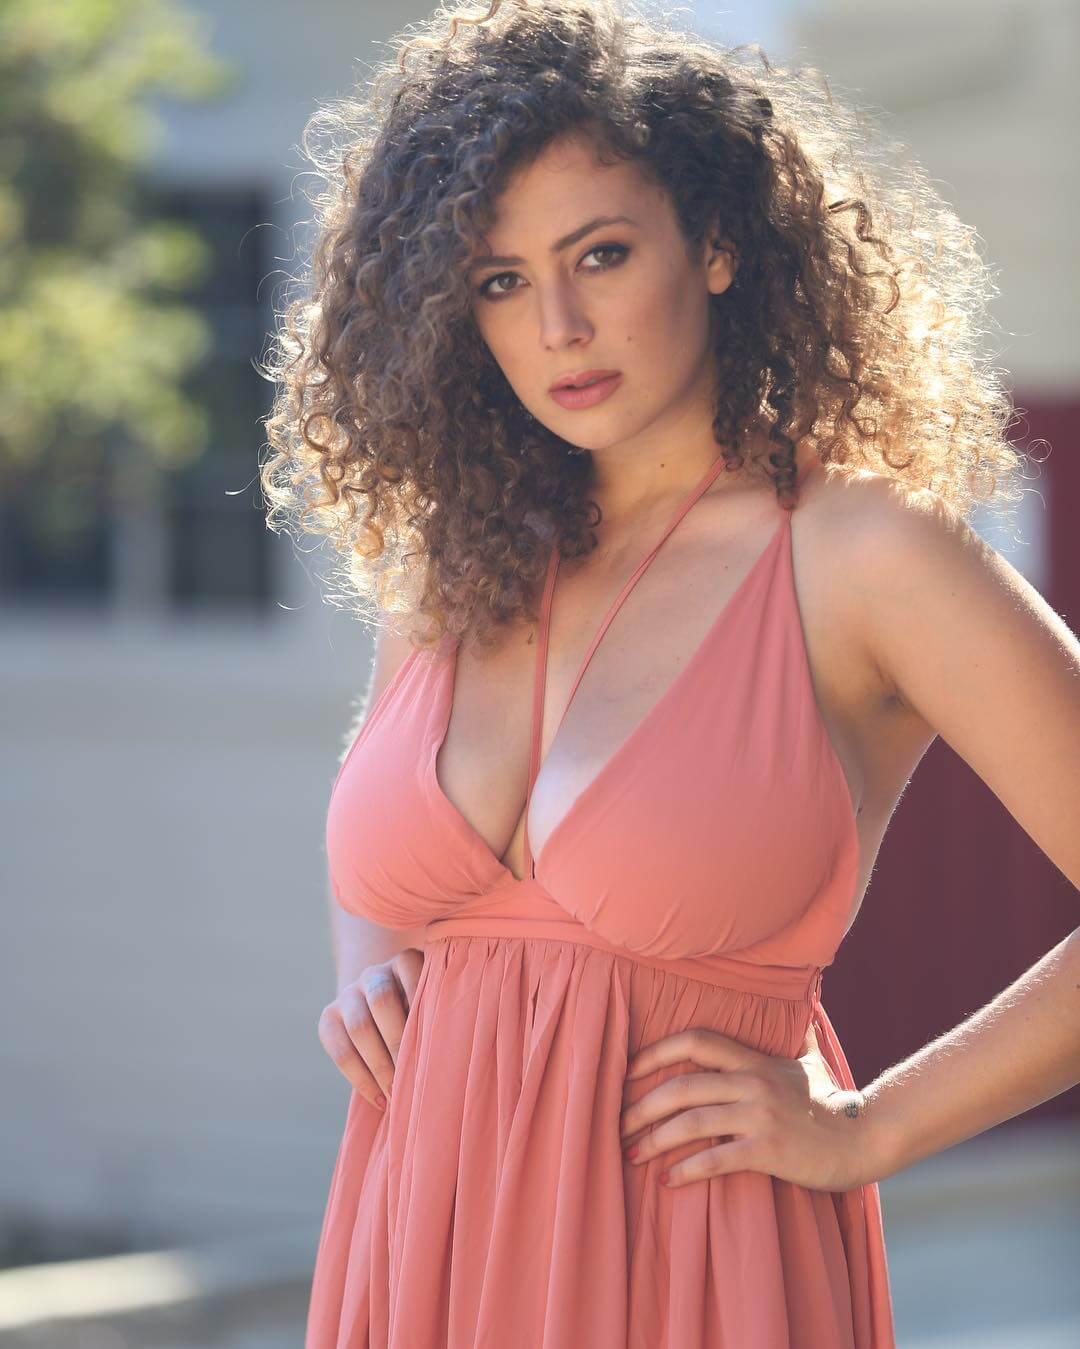 The Hottest Photos Of Leila Lowfire - 12thBlog